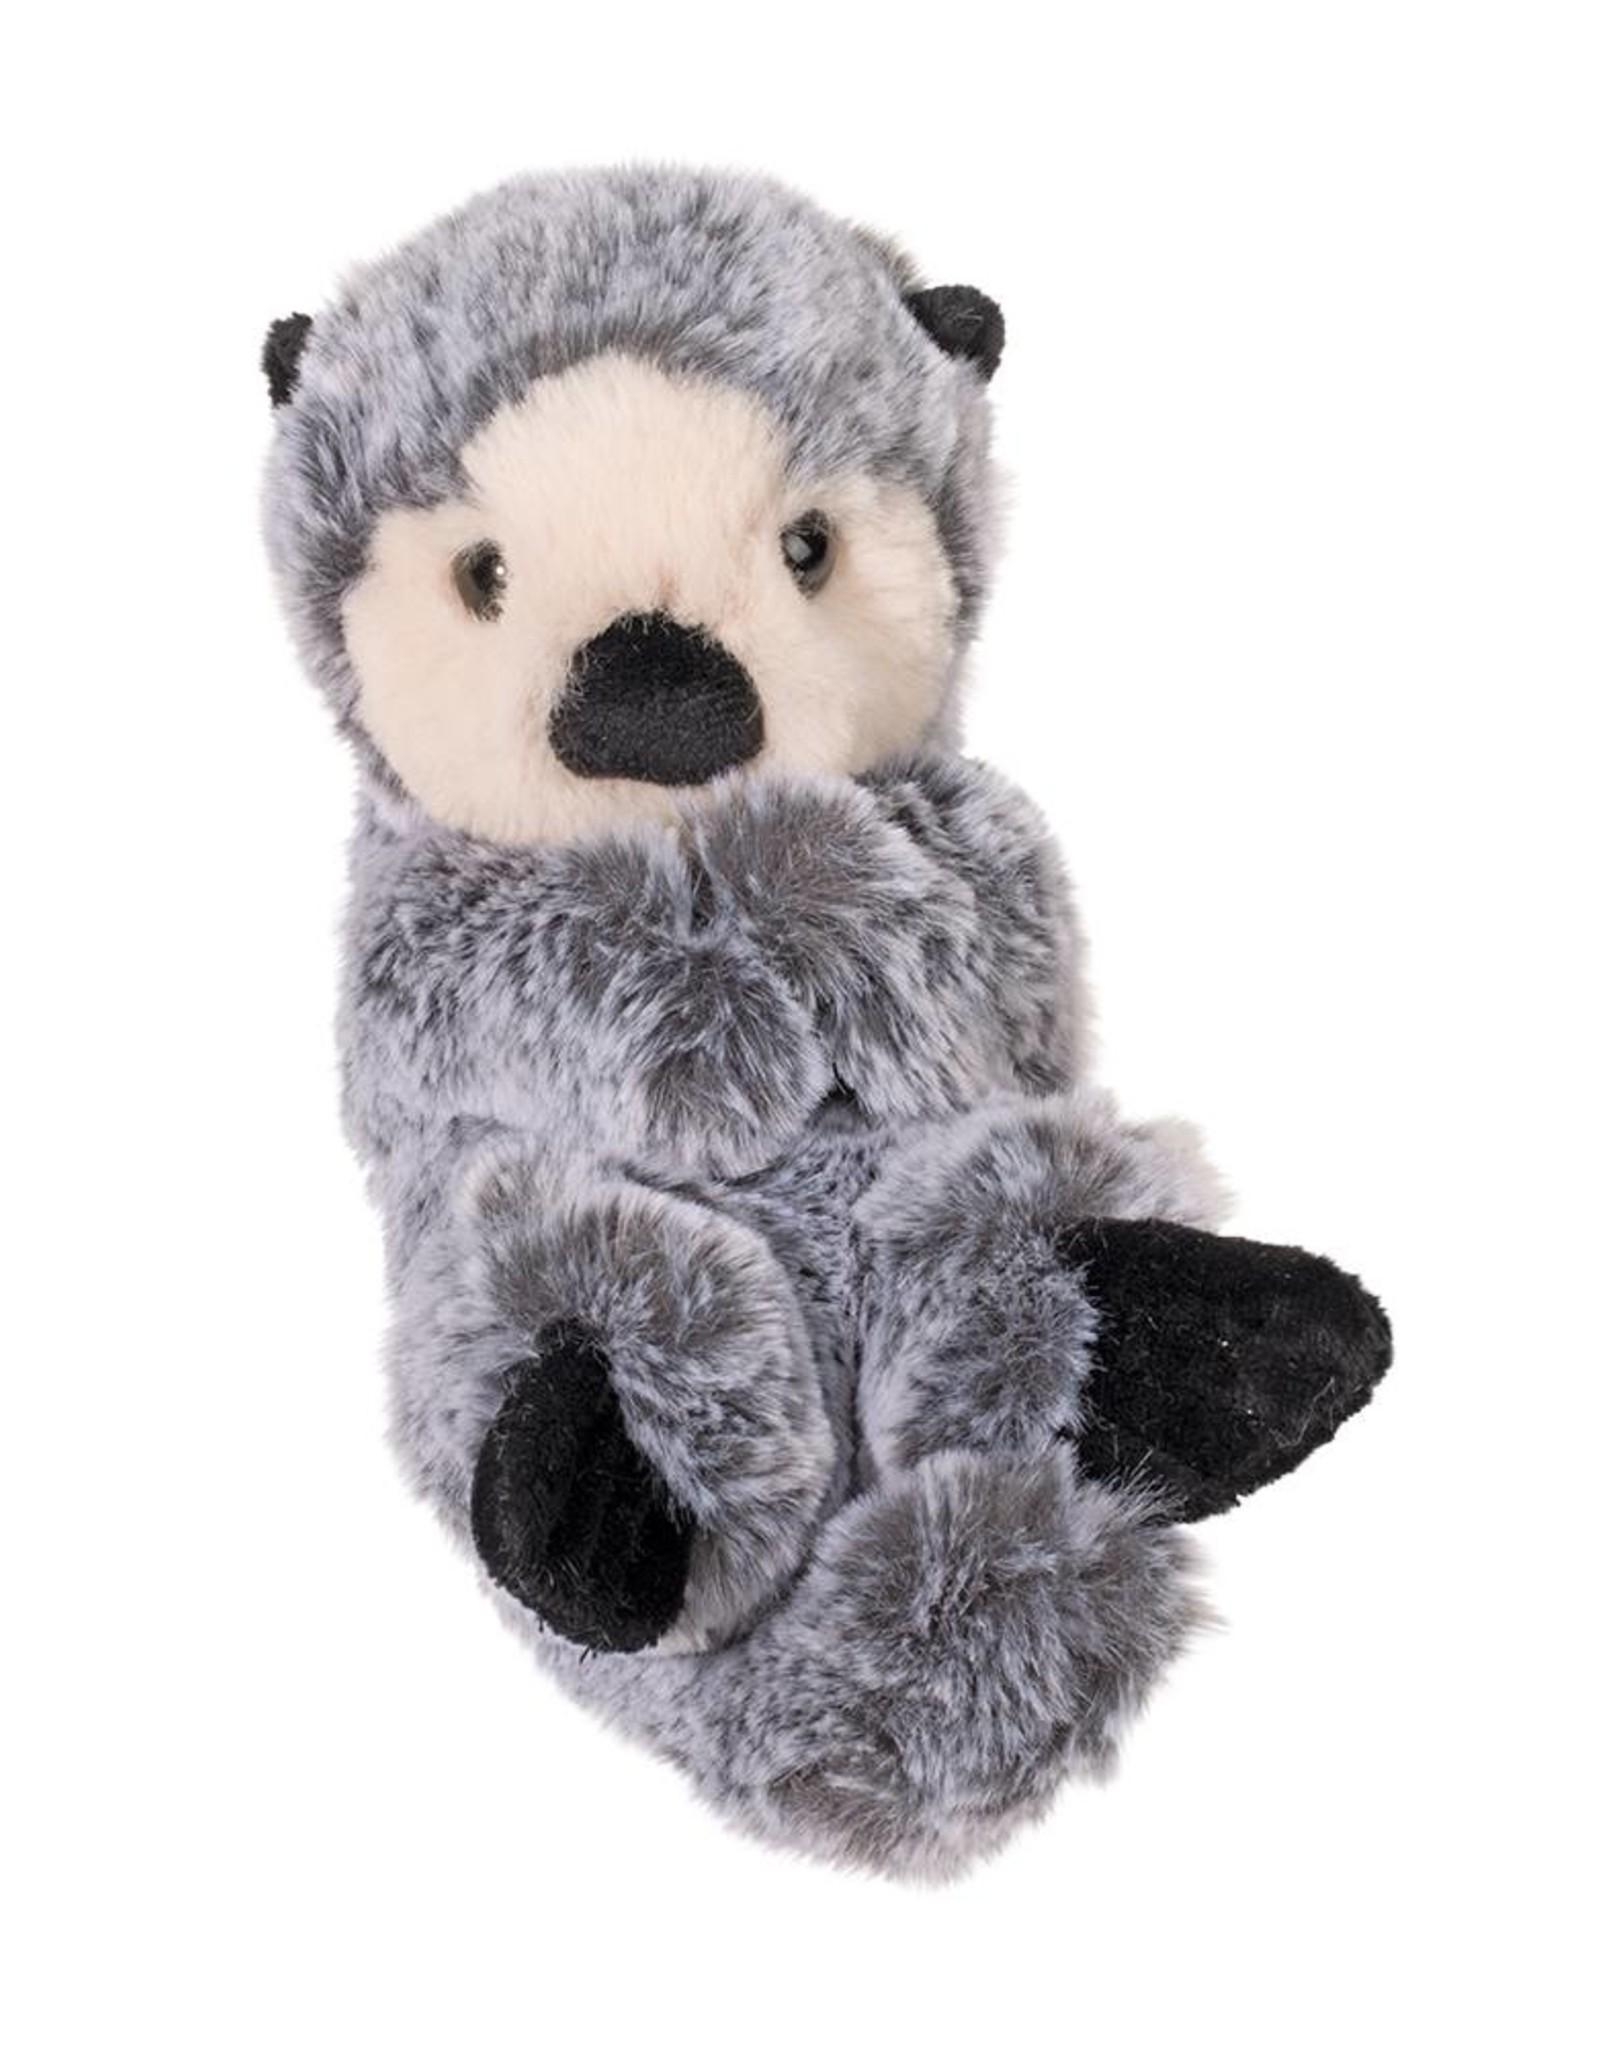 Douglas Douglas - Baby Otter Lil' Handful